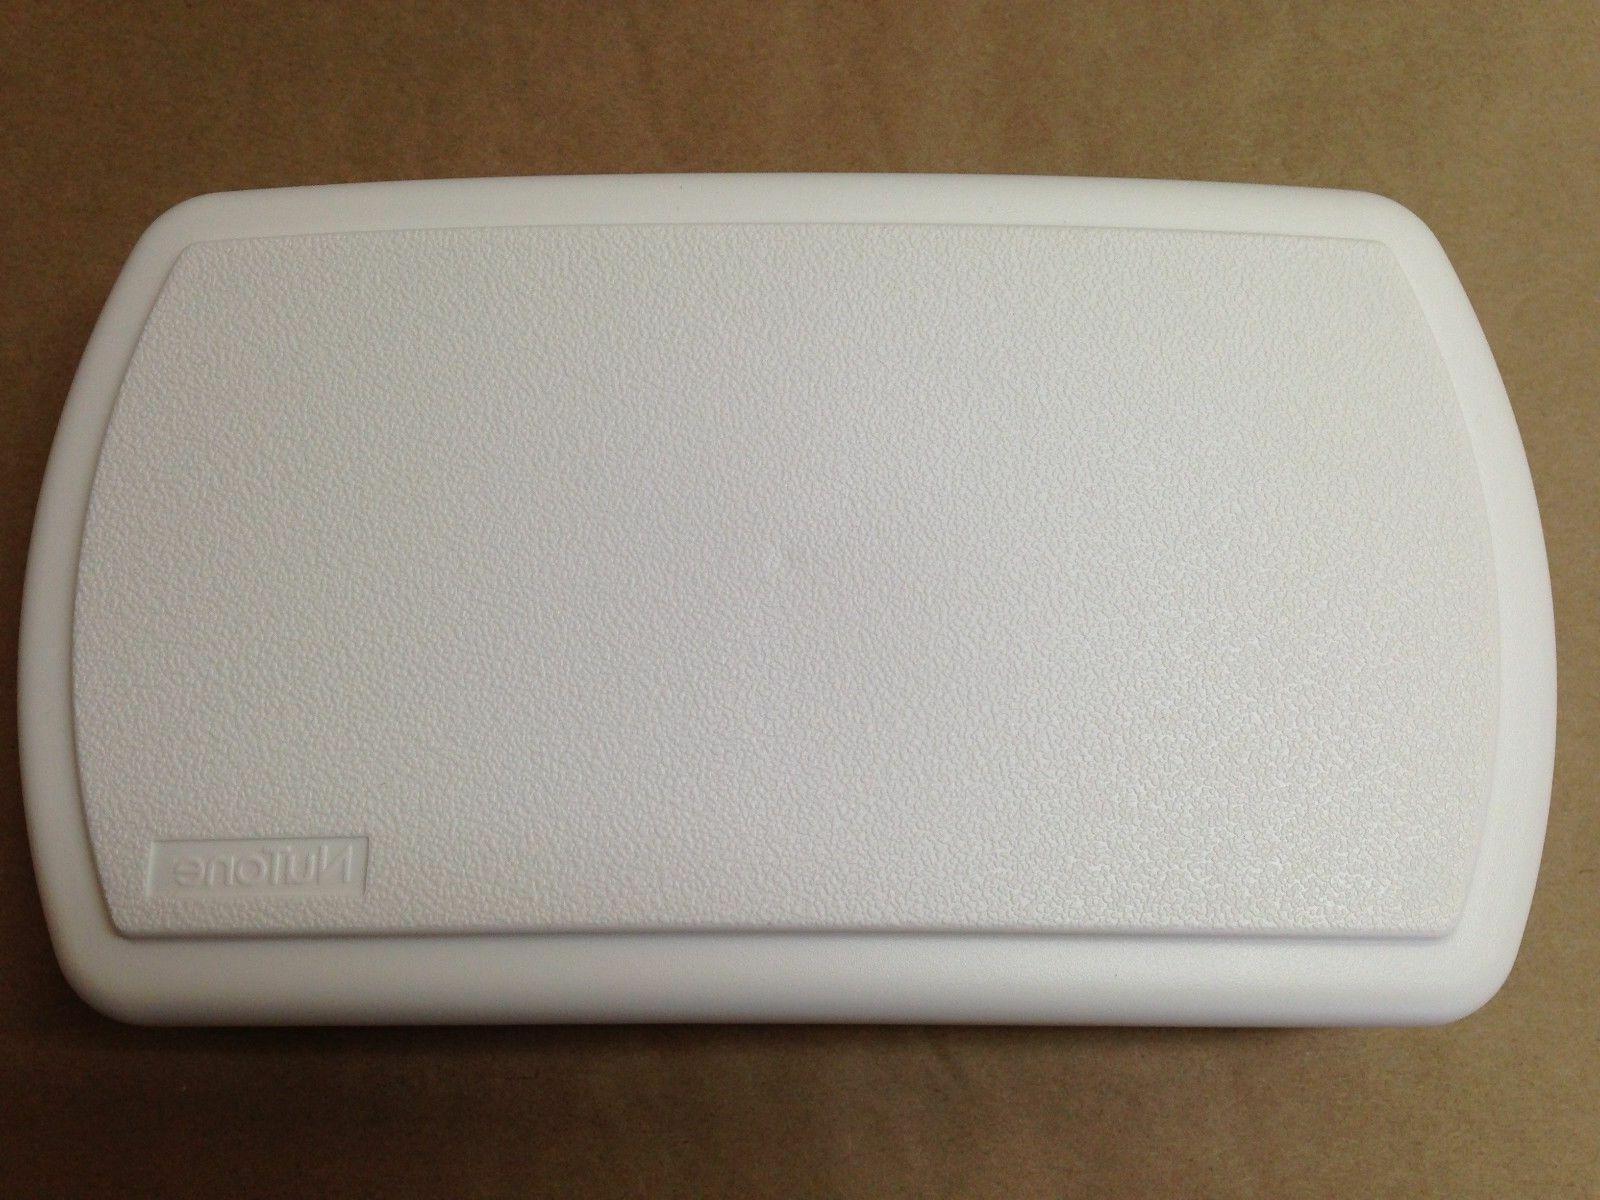 nutone white plastic door chime cover doorbell